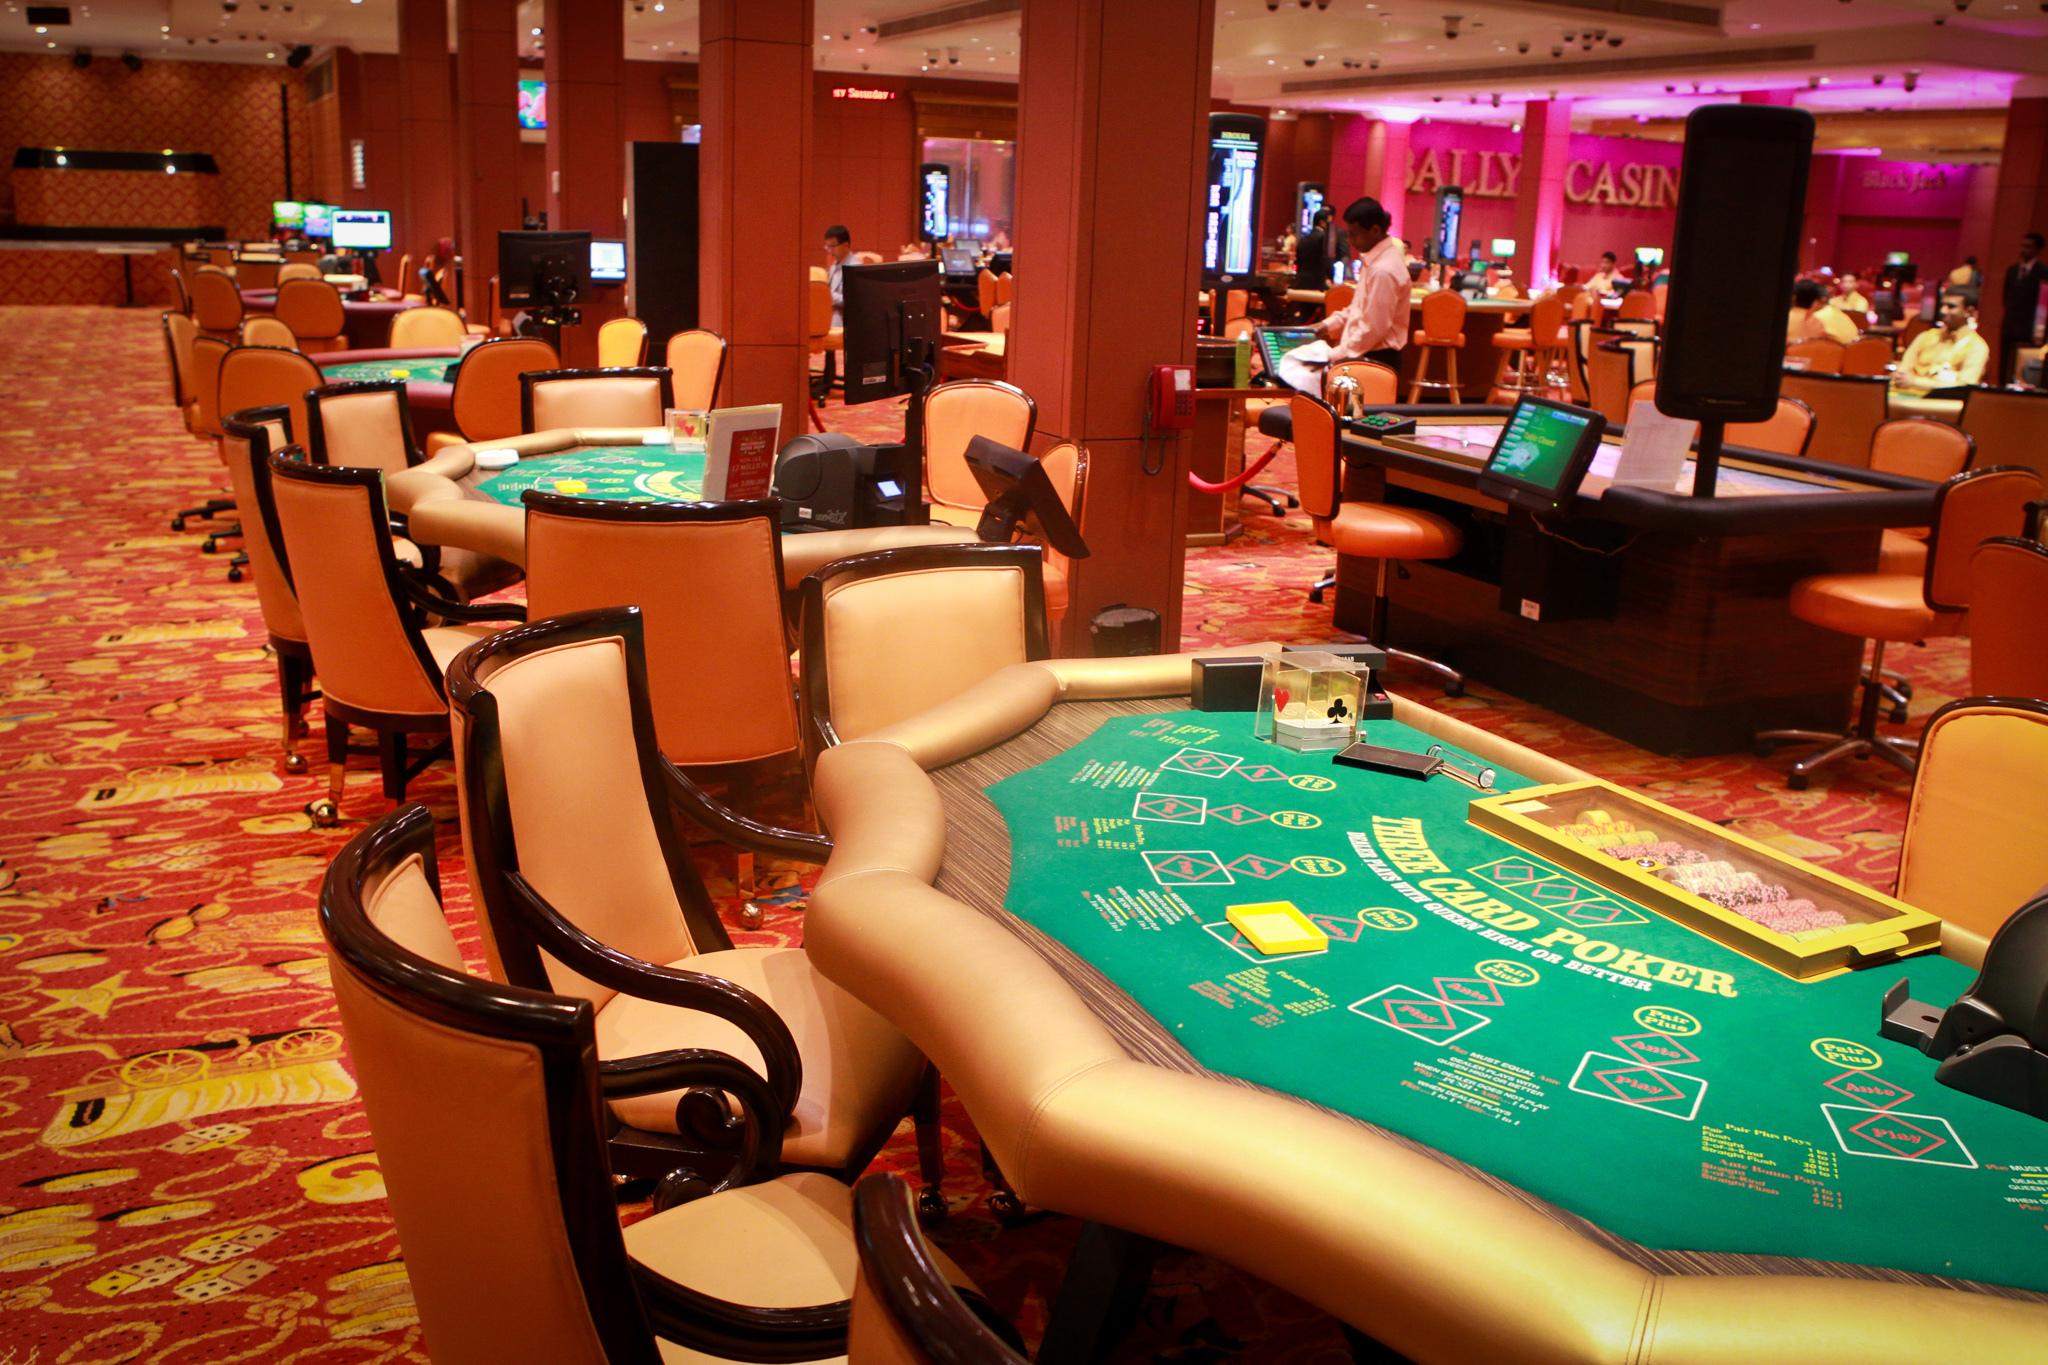 Ballys casino hotel zac brown band snoqualmie casino